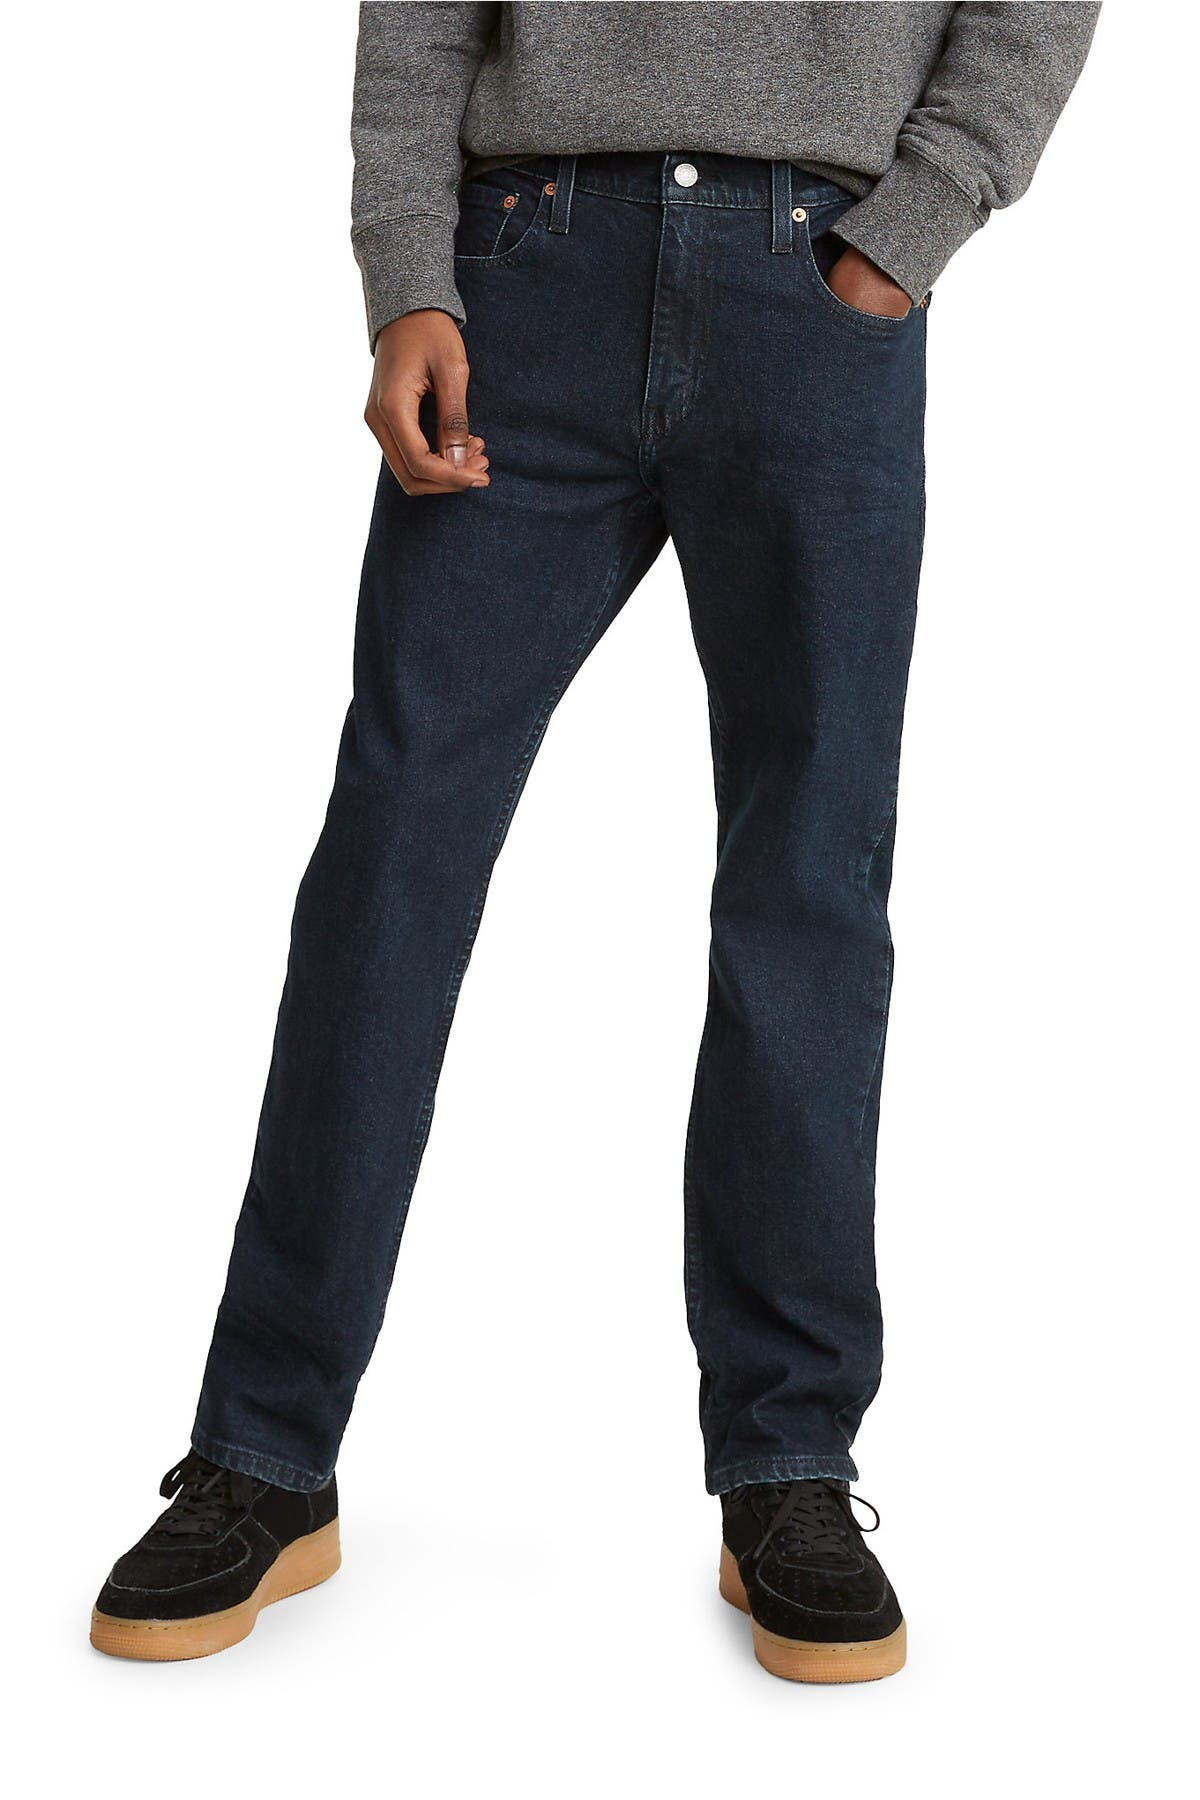 "Image of Levi's 502 Taper Jeans - 31"" Inseam"